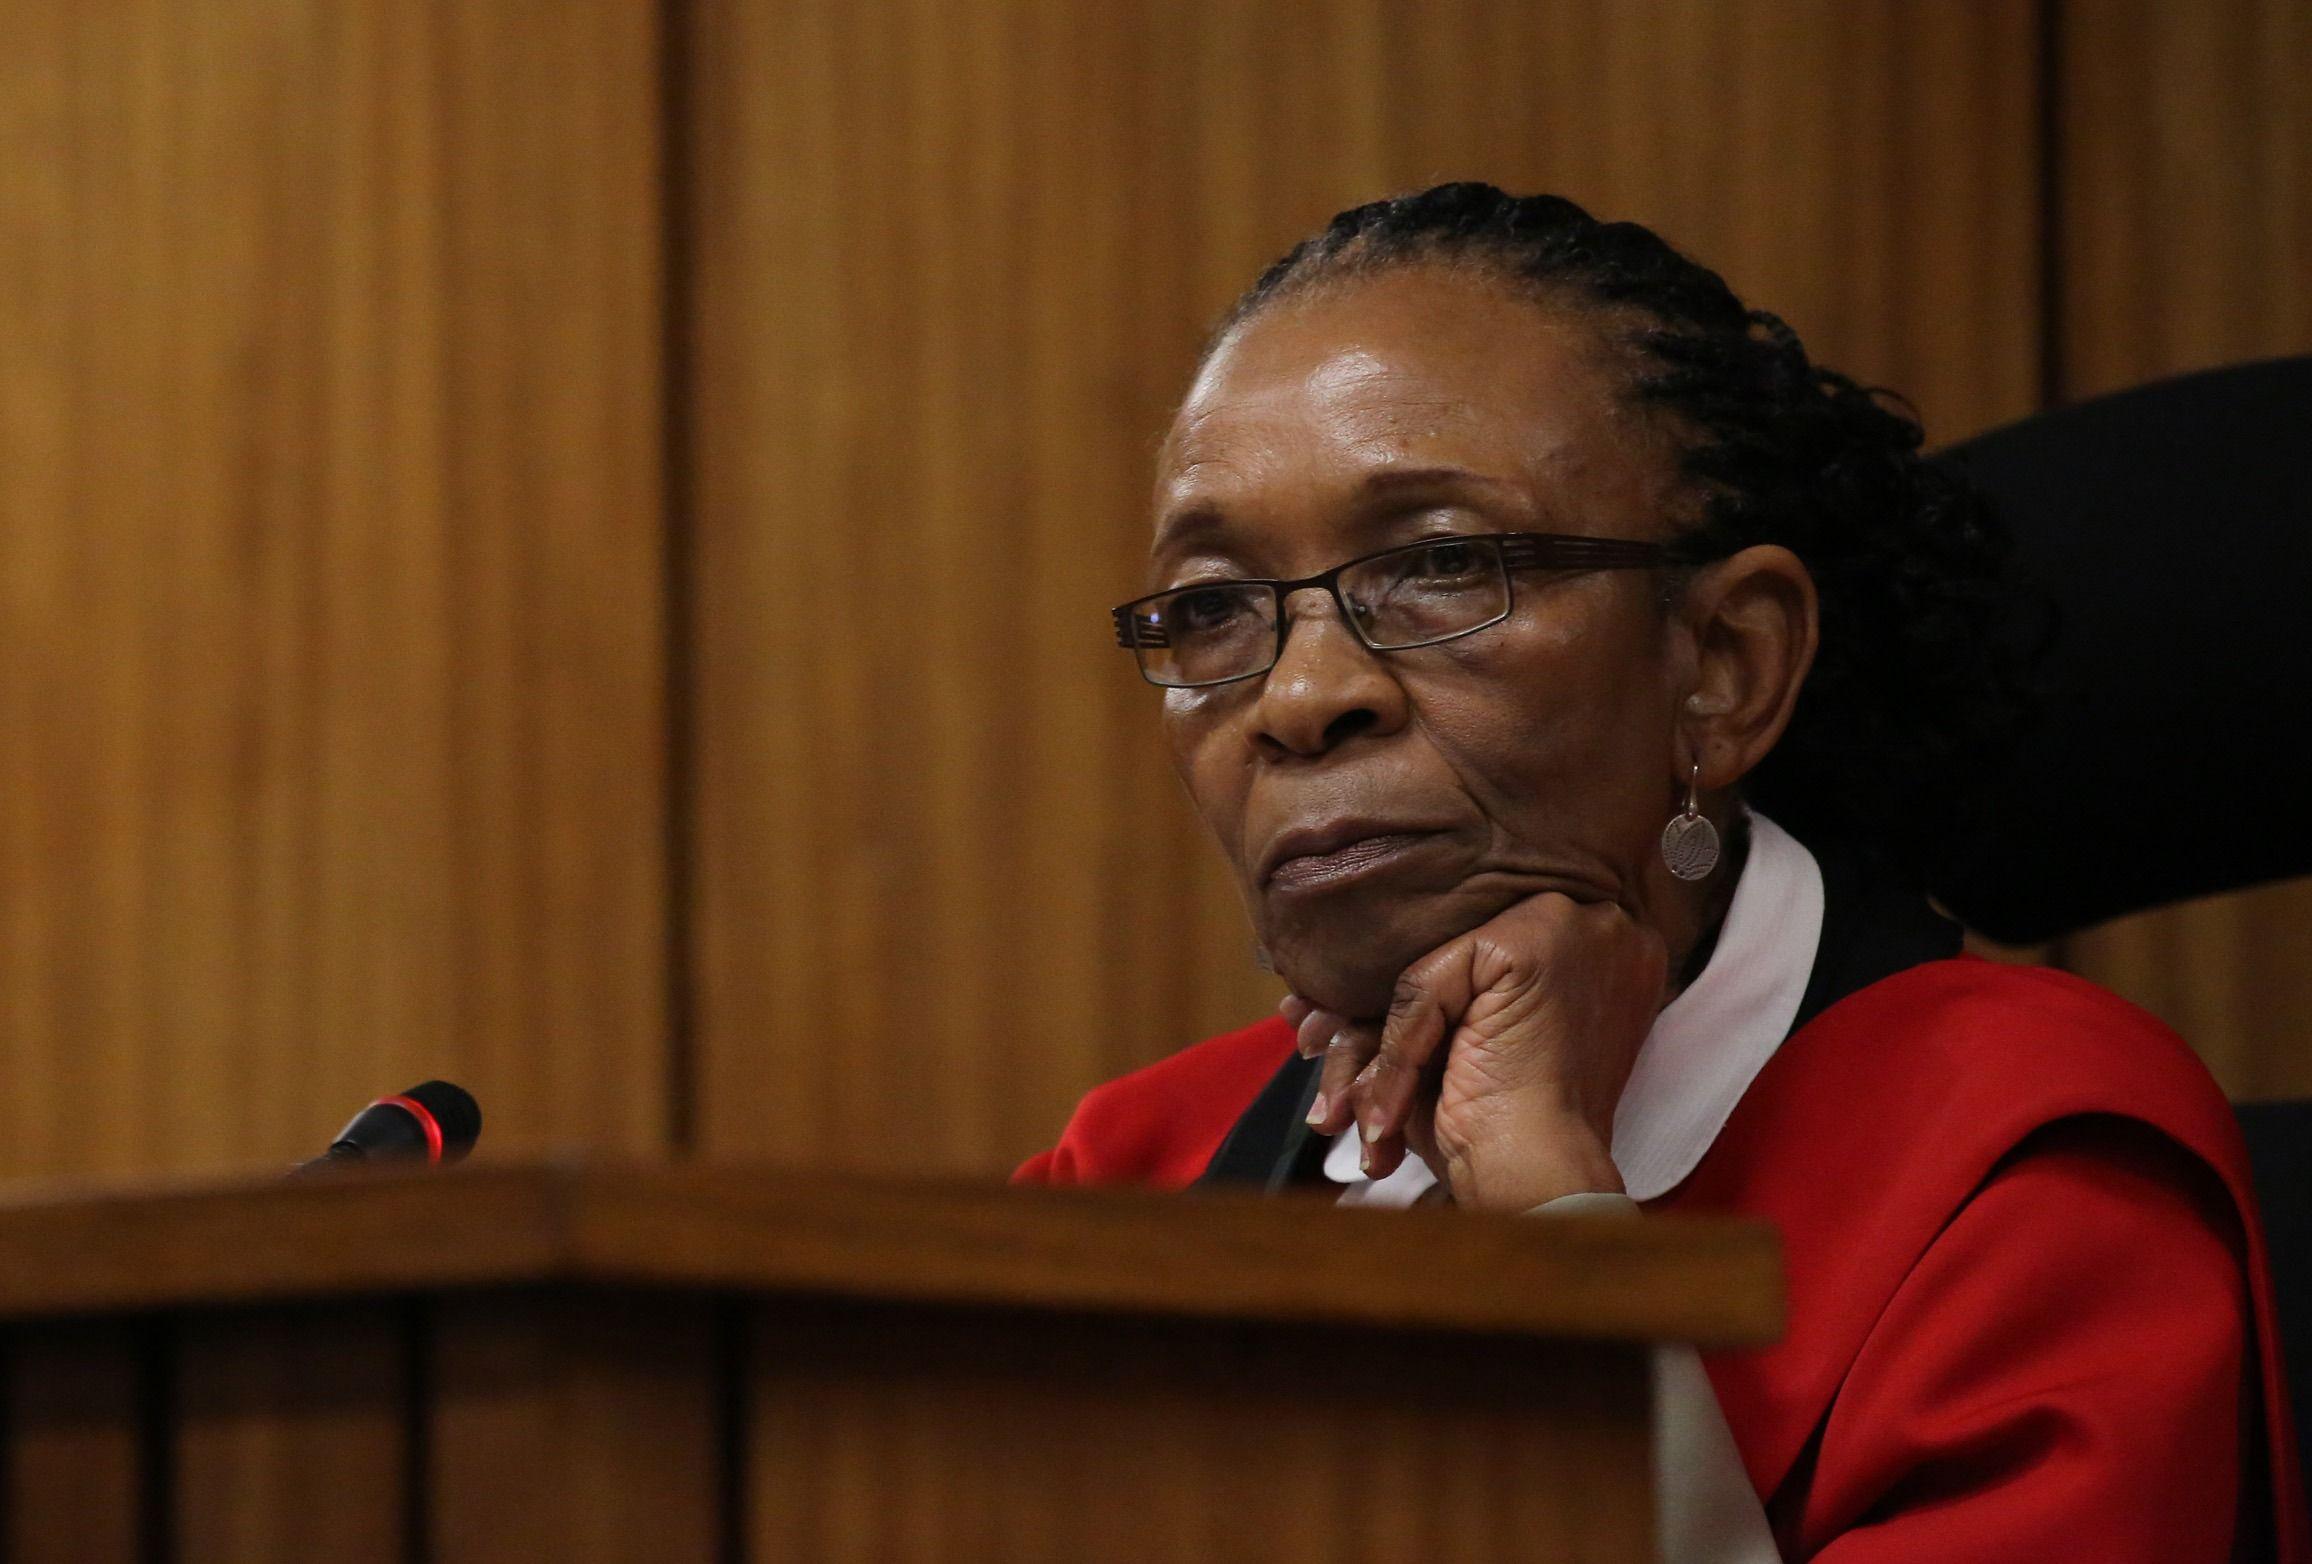 Judge Thokozile Masipa in Oscar Pistorius resentencing